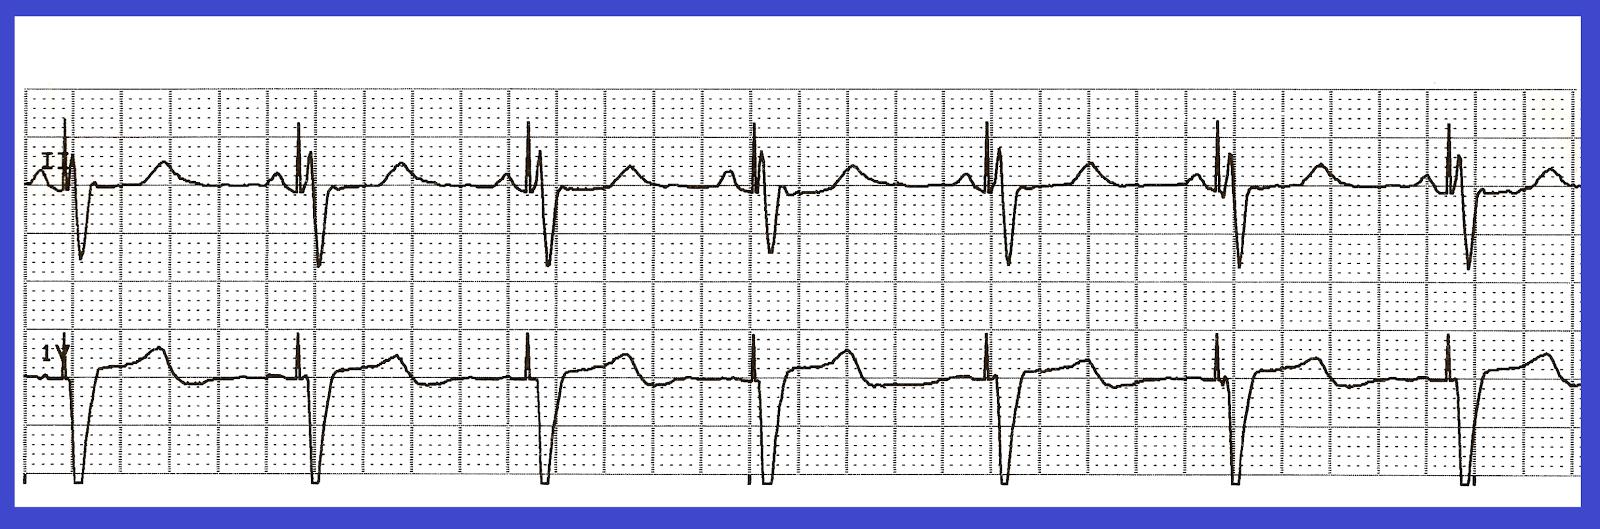 Polymorphic Ventricular Tachycardia | www.imgkid.com - The ...